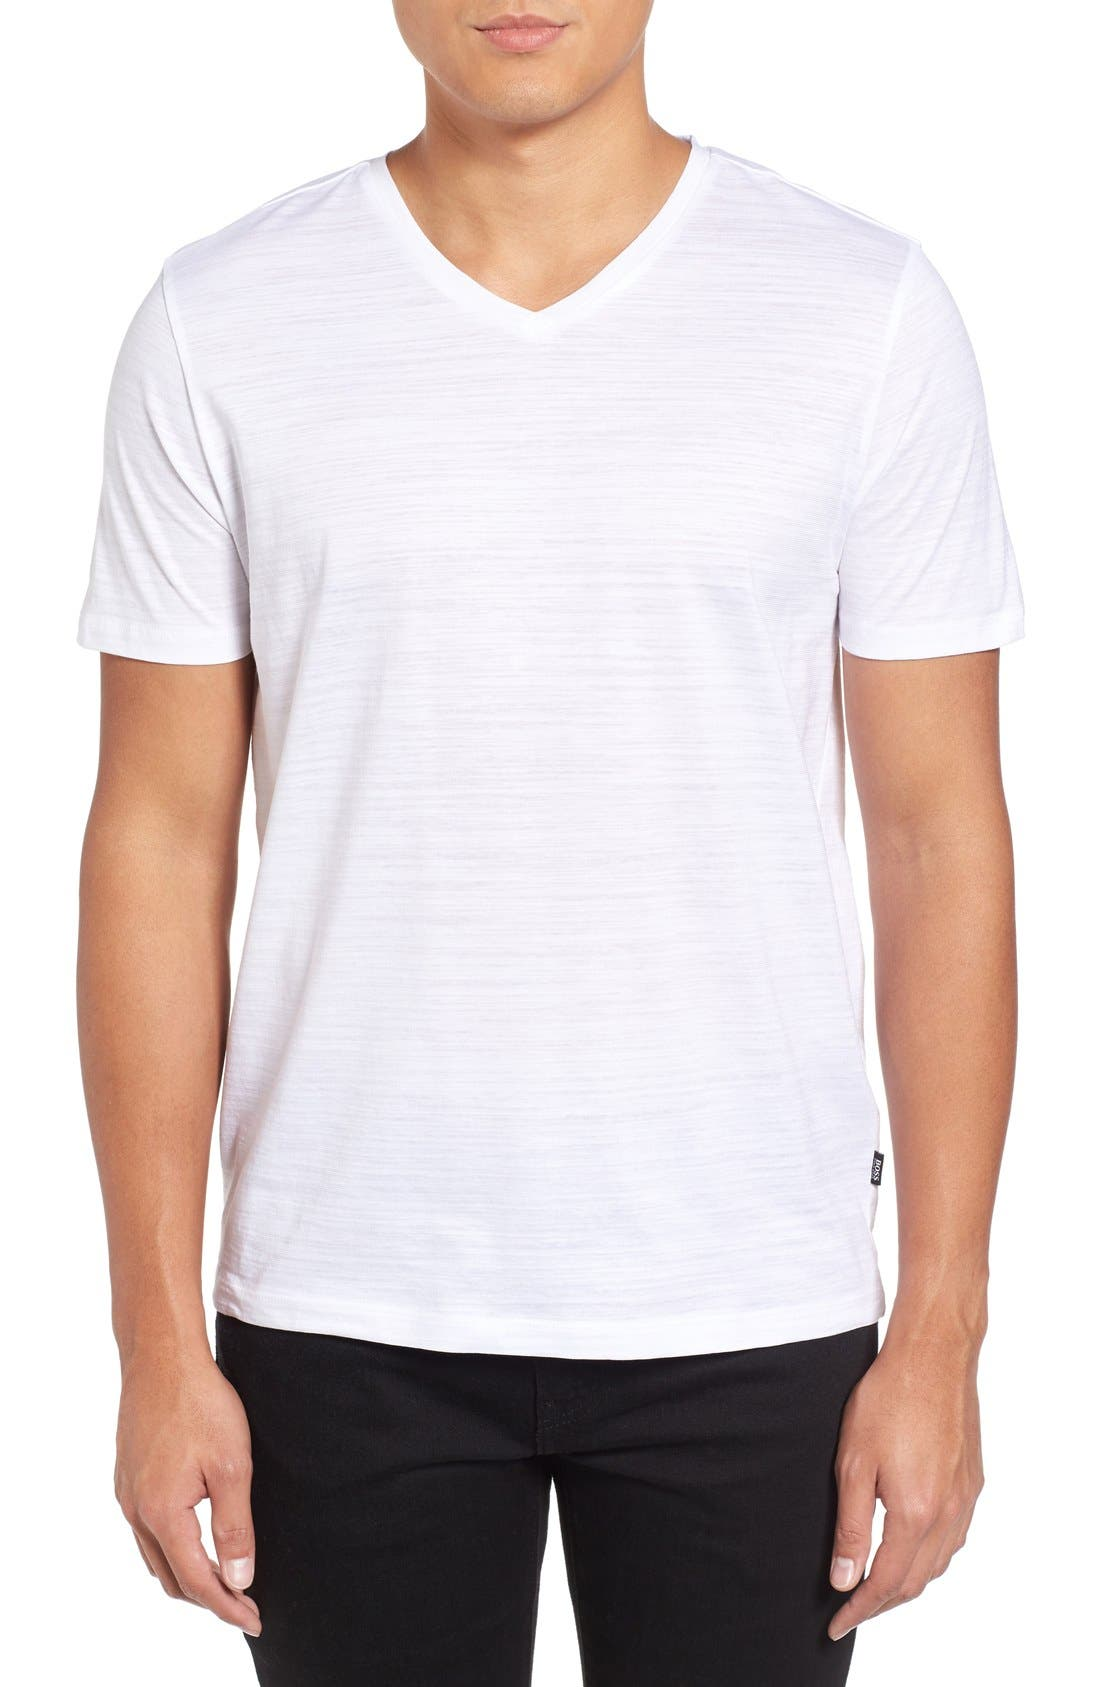 Tilson 50 V-Neck T-Shirt,                             Main thumbnail 1, color,                             White